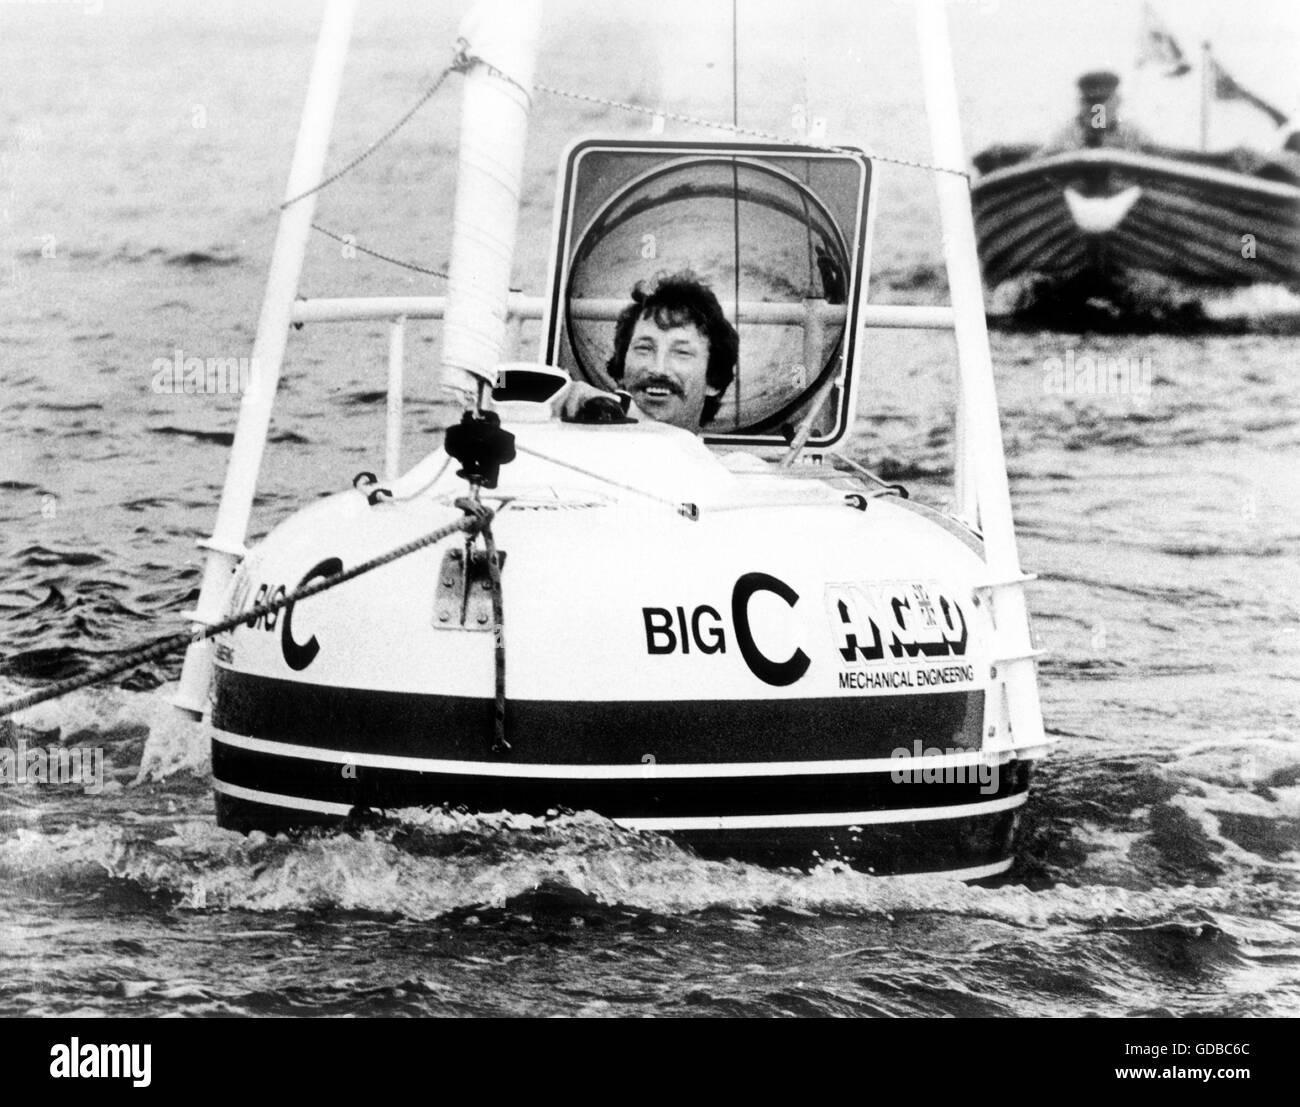 AJAX-NEWS-FOTOS. 20. JULI 1983. SOUTHAMPTON, ENGLAND. -KLEINSTE BOOT - LIVERPOOLER TOM MCNALLY IN BIG - C, WAS BEHAUPTET Stockbild